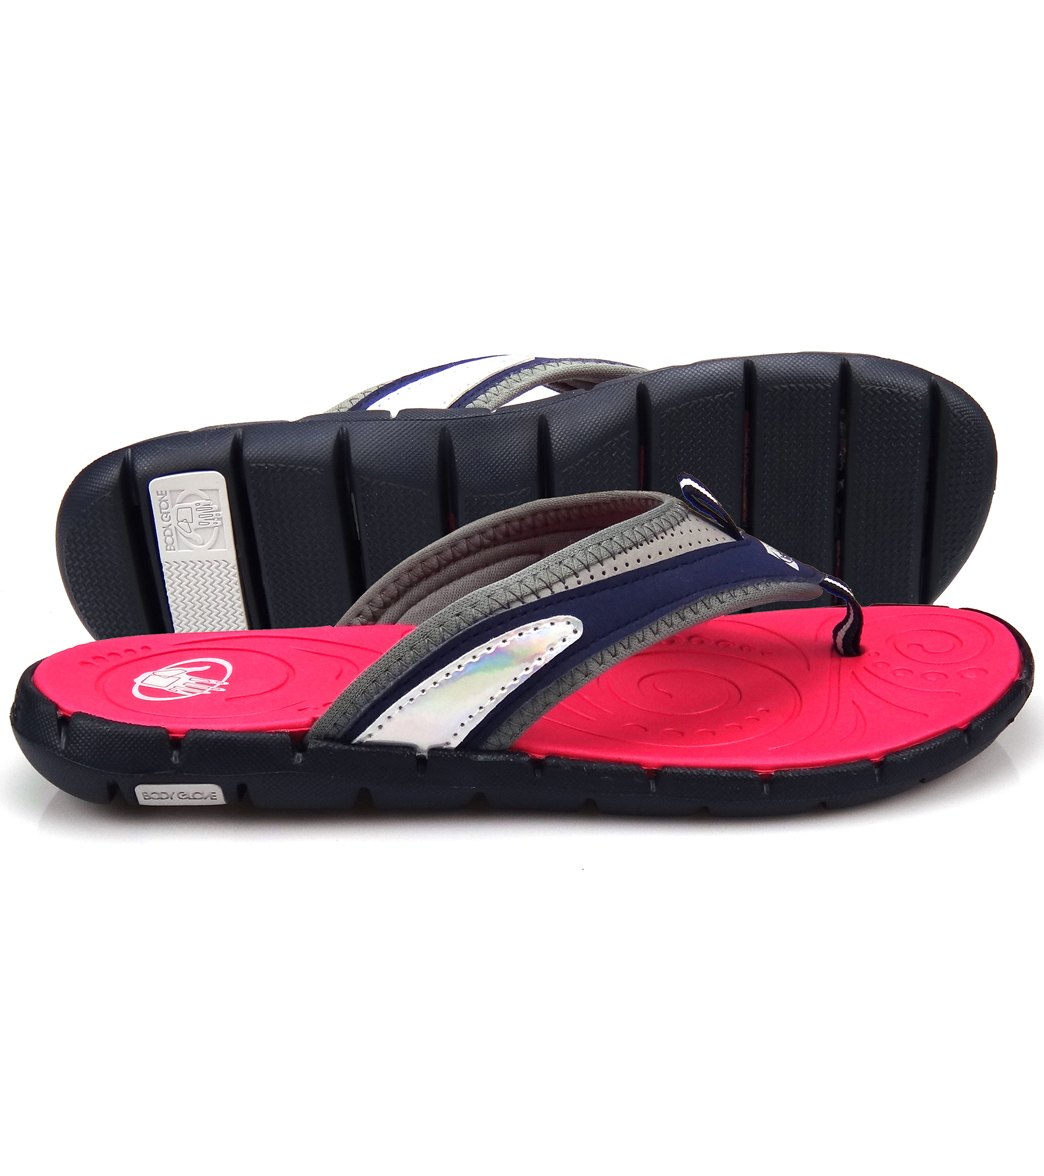 9f6ca0cb1 Body Glove Women s Cozy Flip Flop at SwimOutlet.com